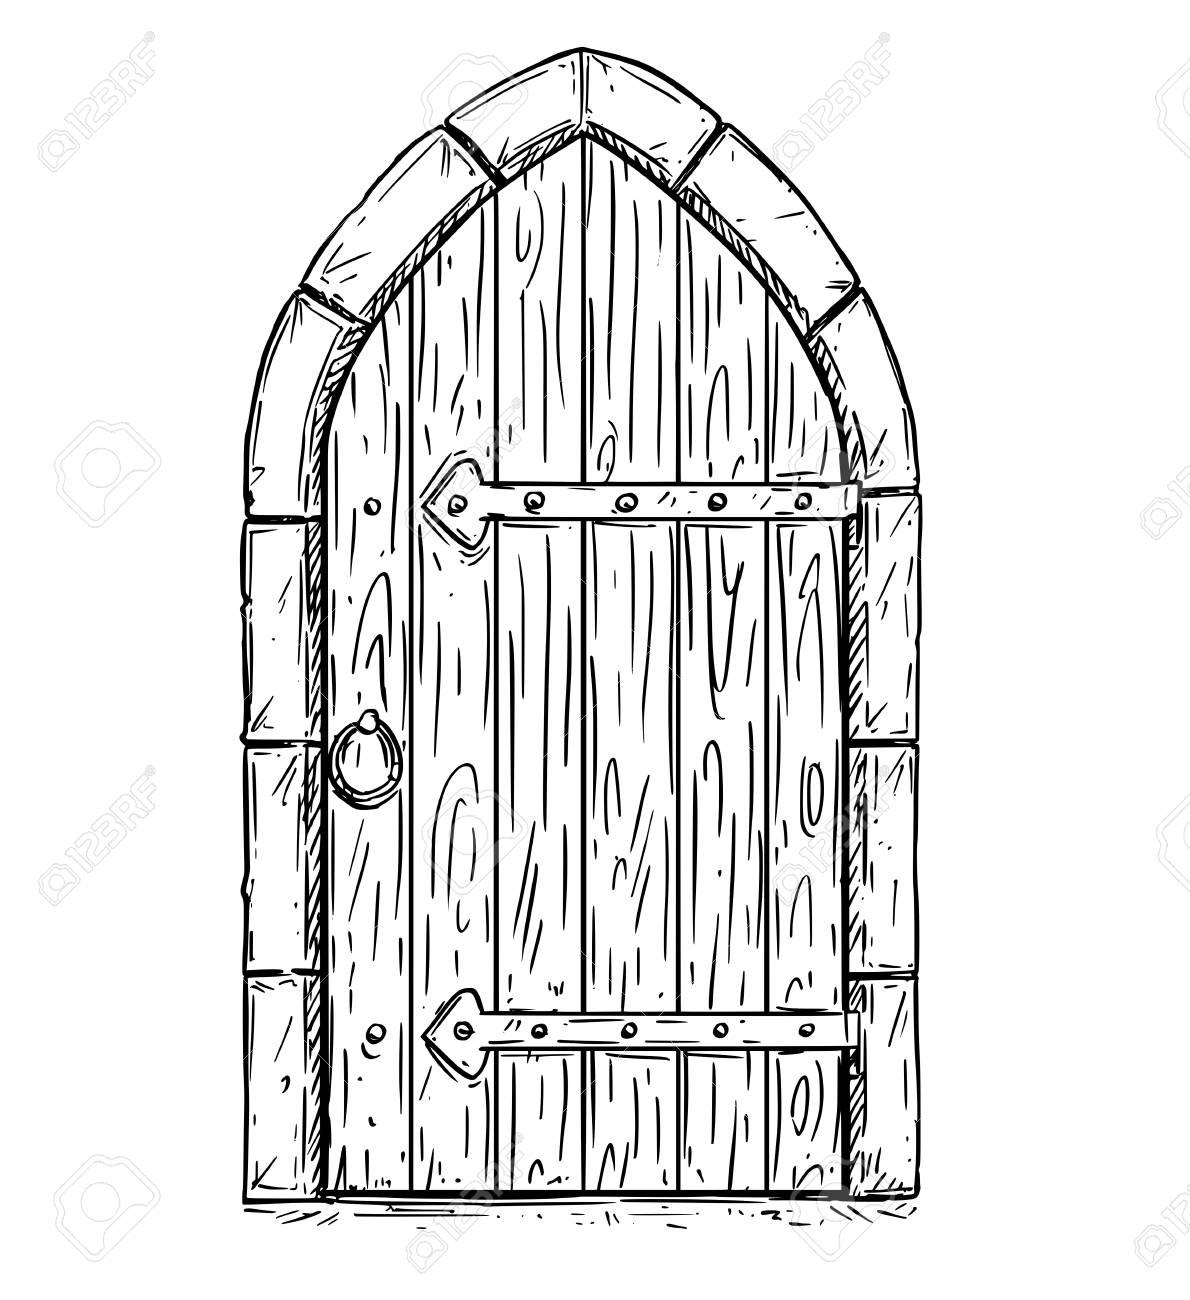 closed door drawing. Cartoon Vector Doodle Drawing Illustration Of Closed Or Locked Medieval Wooden Door. Stock - Door N